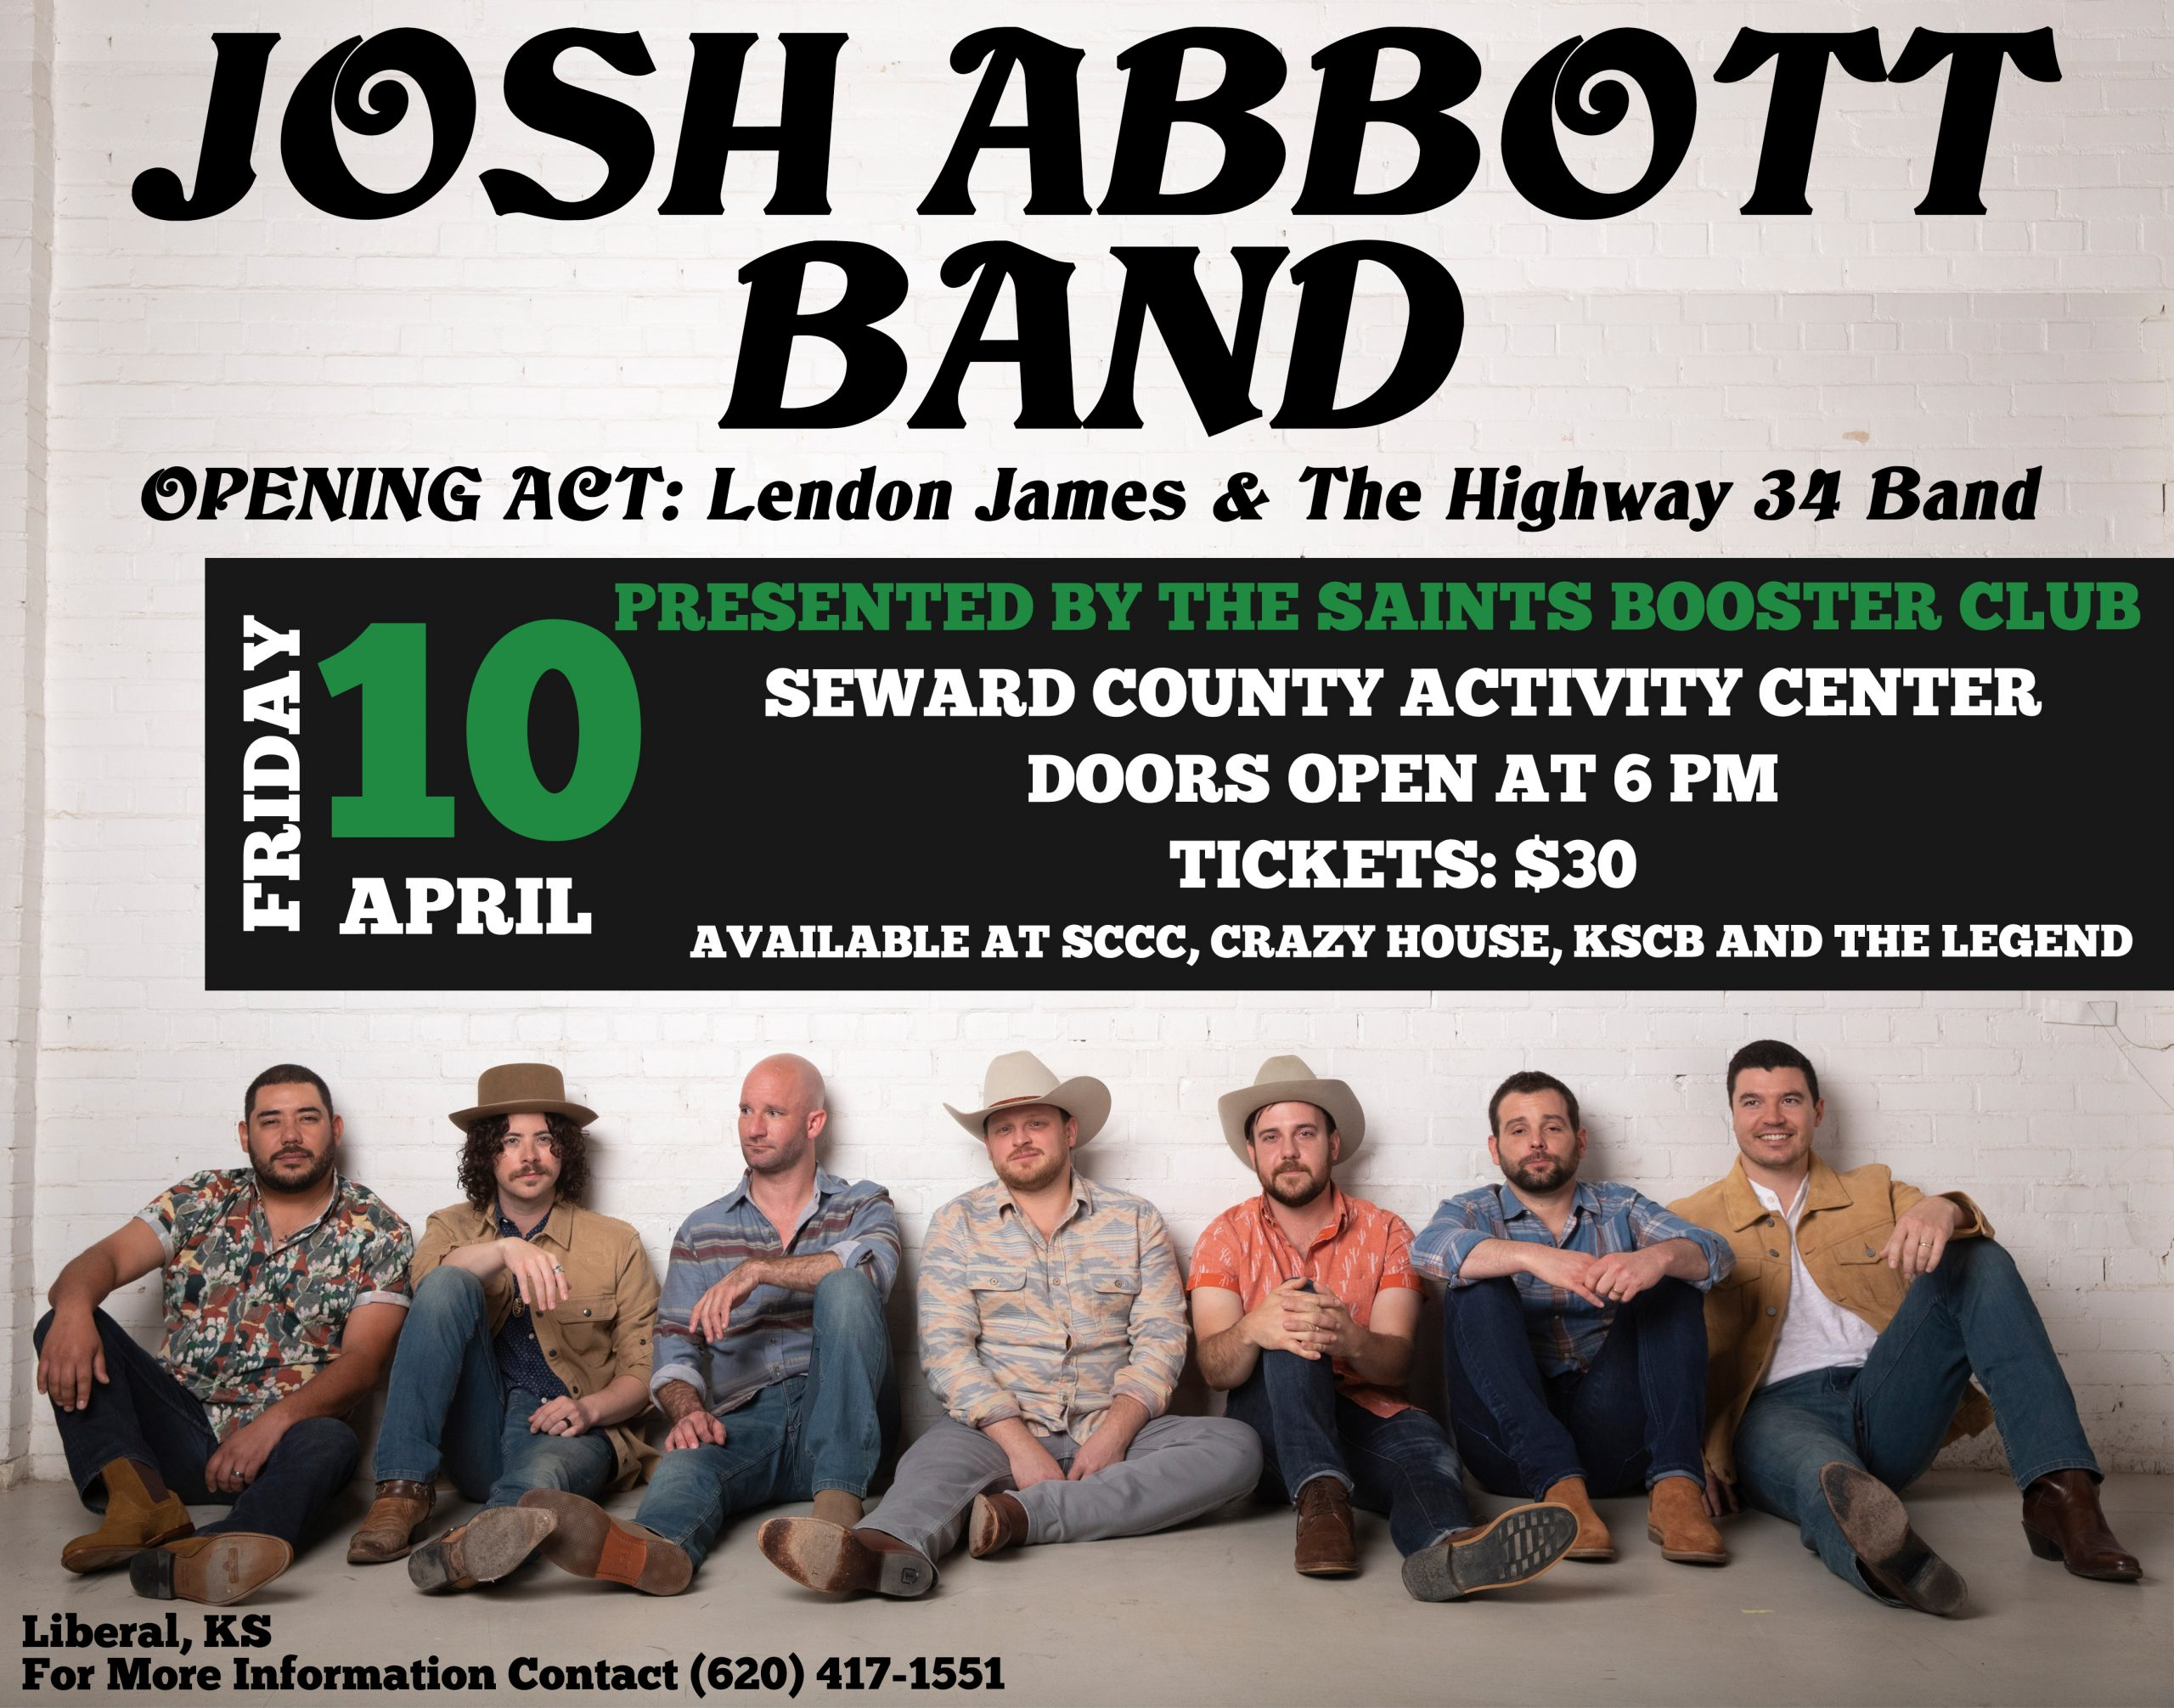 Josh Abbott Band Coming to Liberal